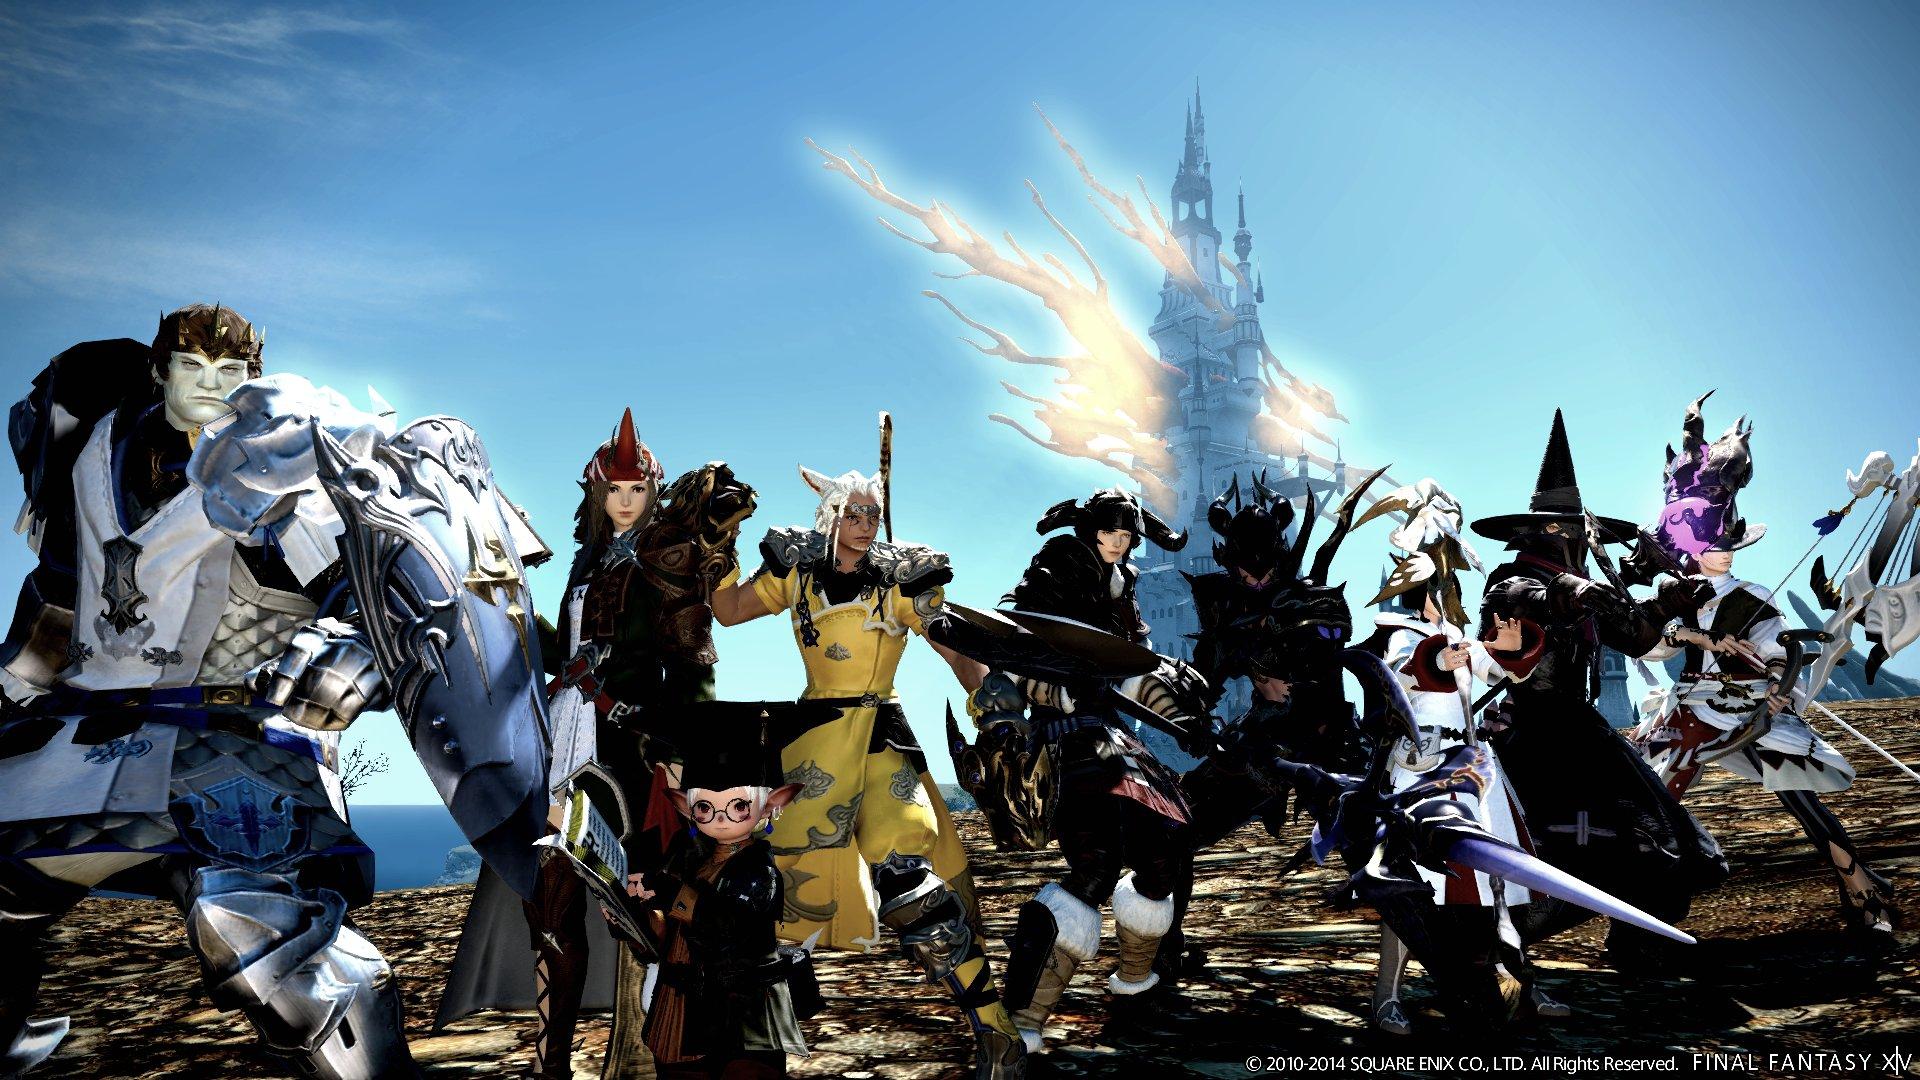 XIV Realm Reborn game adventure online 2 wallpaper background 1920x1080